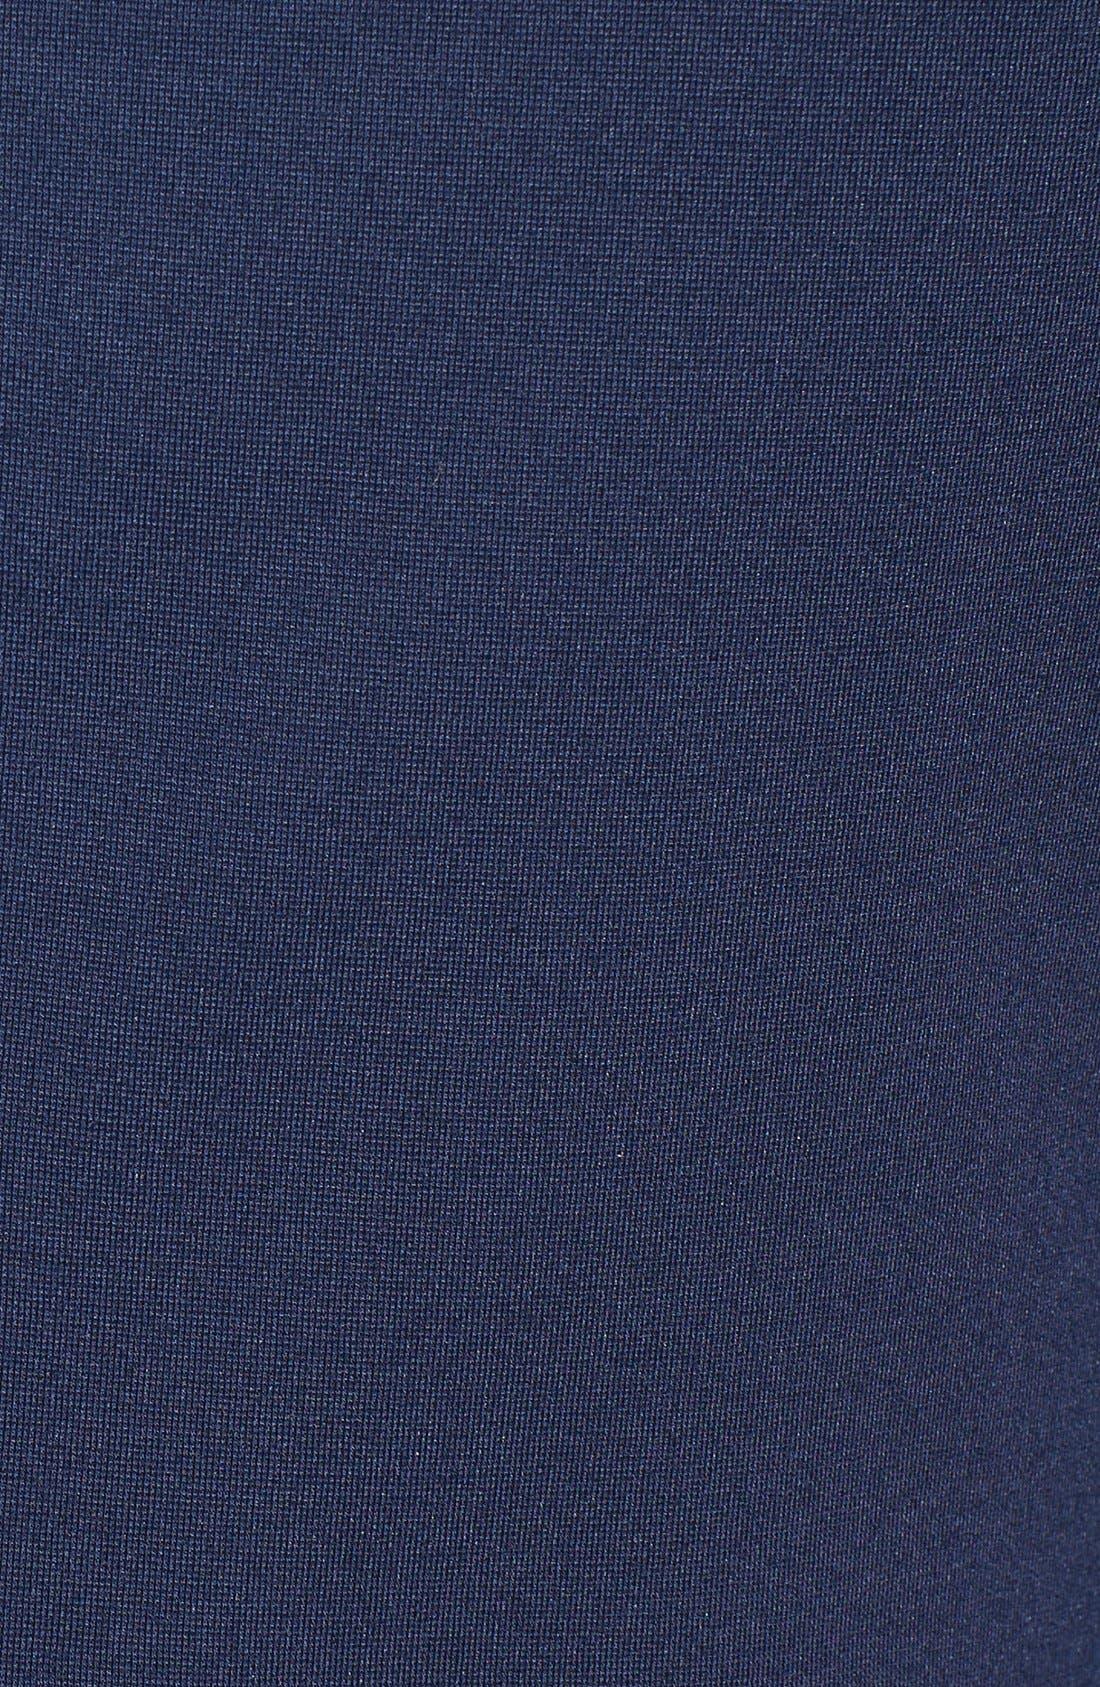 Alternate Image 3  - Trina Turk 'Camilla' Ponte Sheath Dress